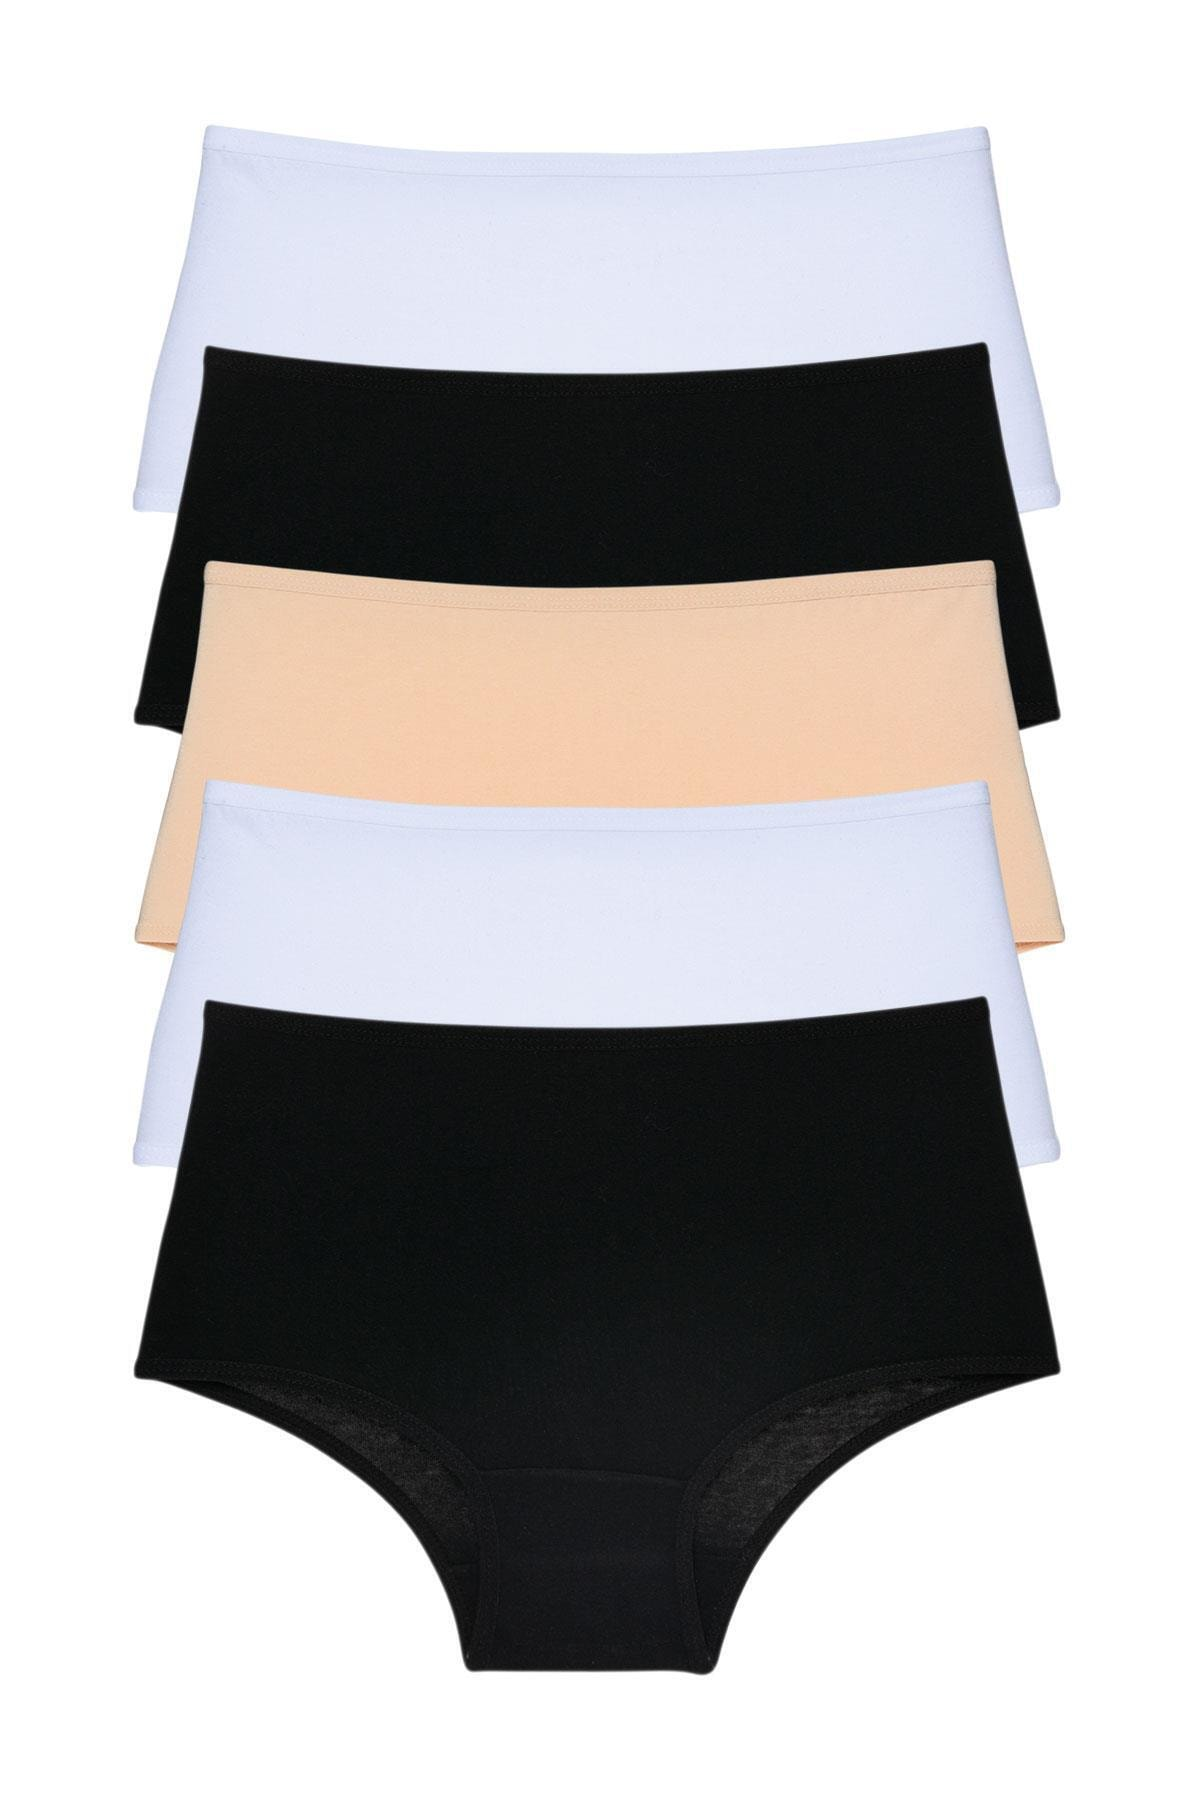 LadyMelex Kadın Siyah Beyaz Ten Yüksek Bel Külot 5'li Paket 1